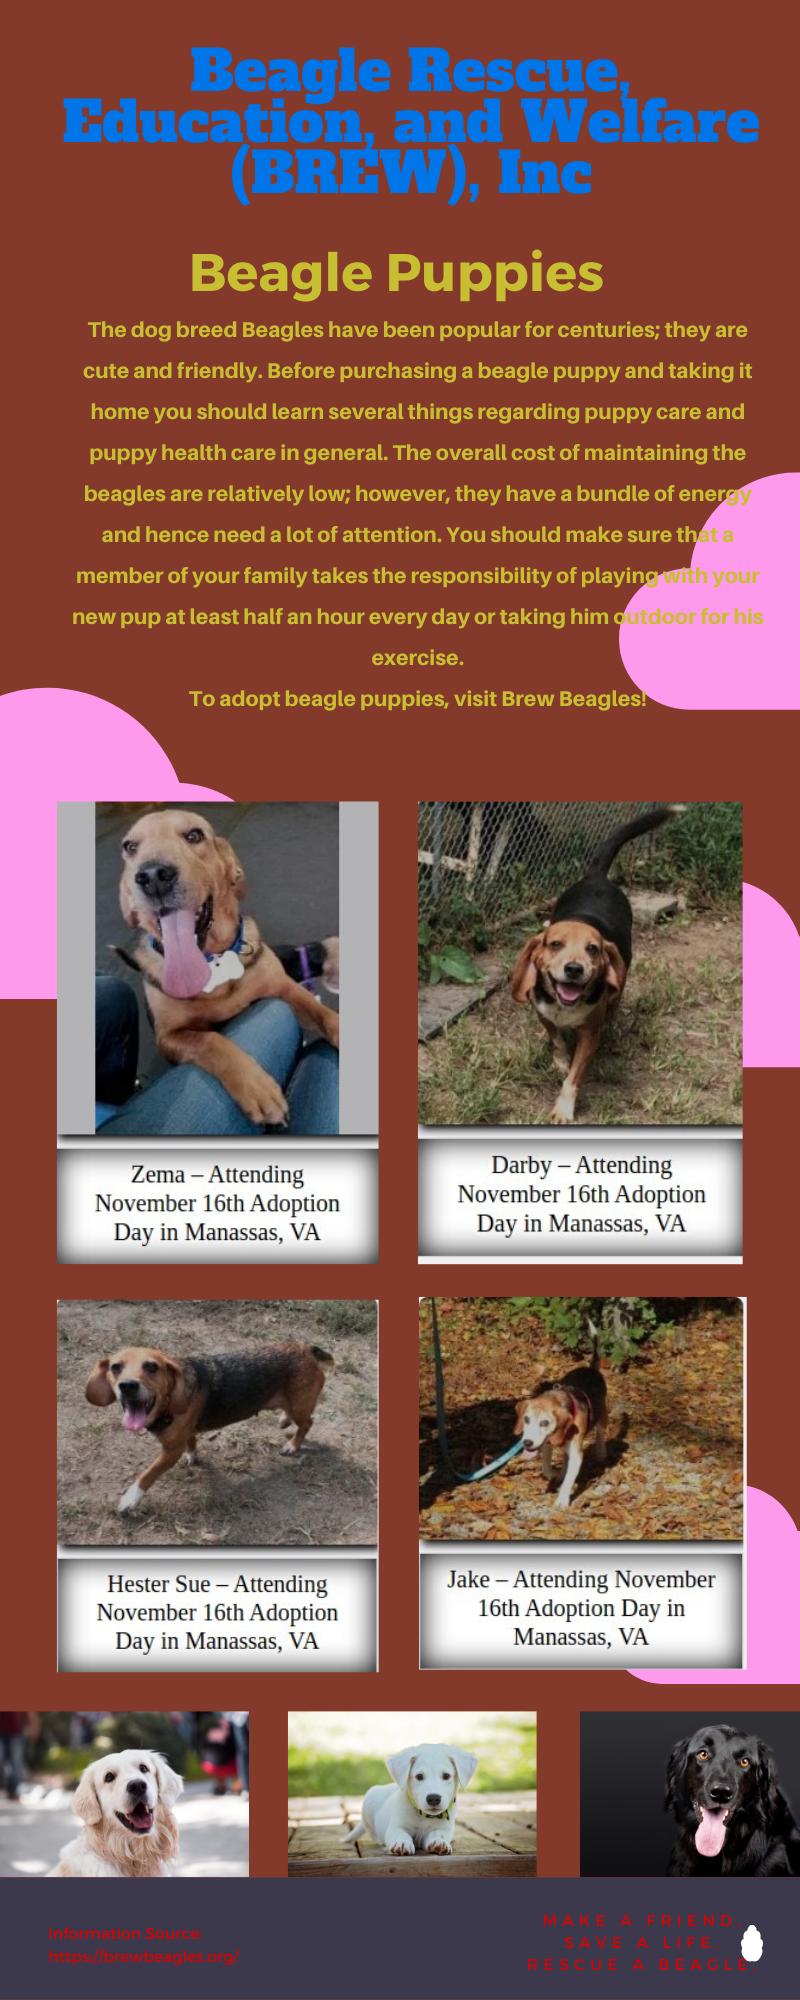 Beagles For Adoption Rescue Dogs For Adoption Beagle Puppy Adoptable Beagle